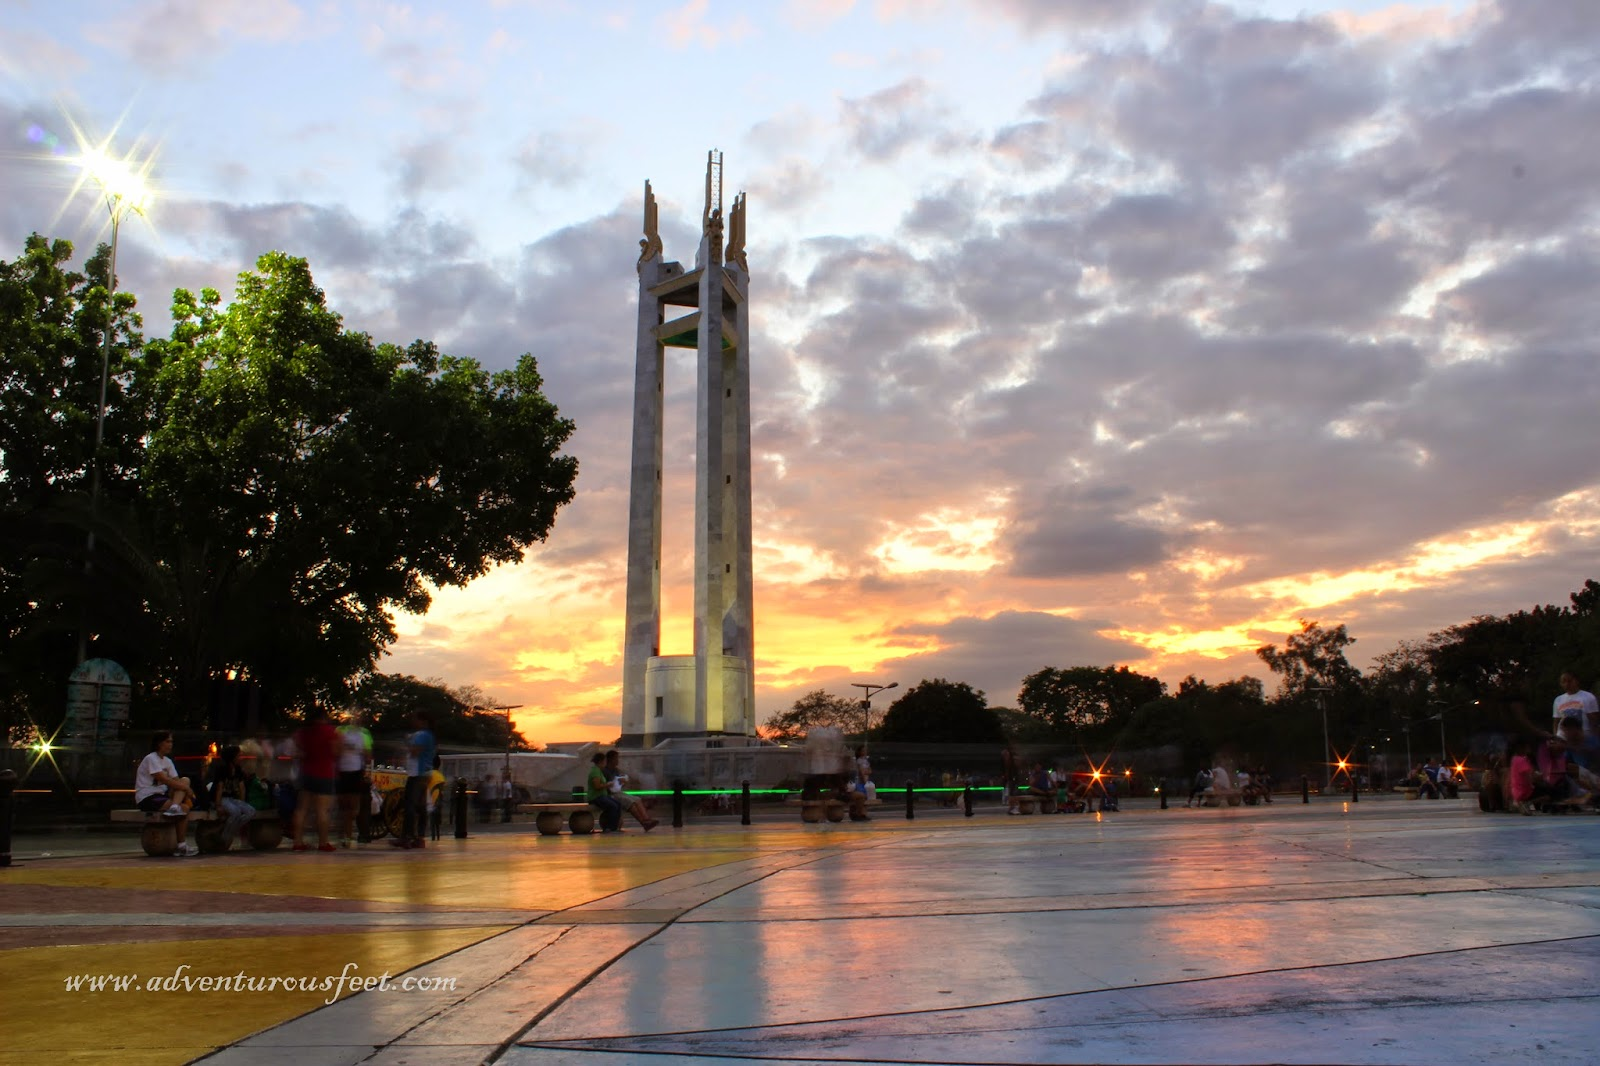 Adventurous Feet Quezon City Photowalk At Up Diliman And Quezon City Circle